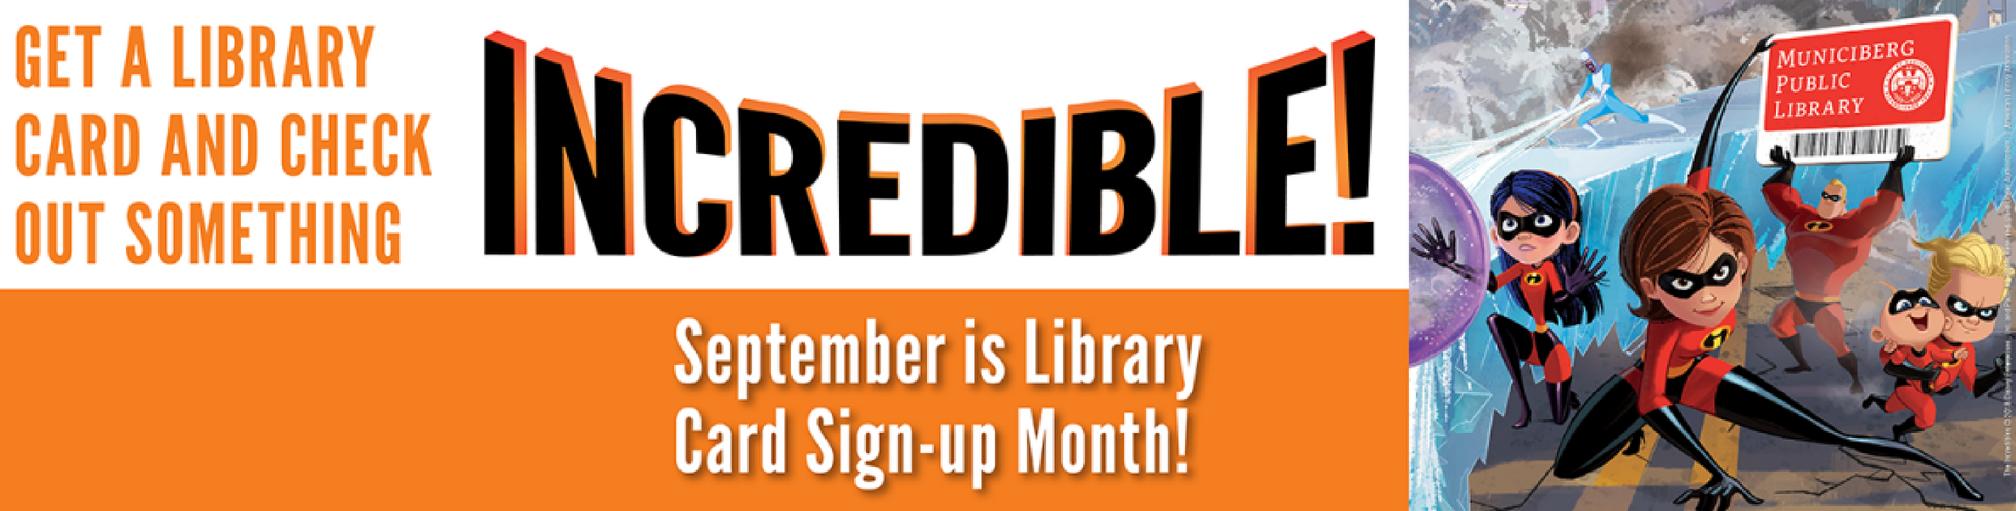 Shreve memorial library la official website official website september is library card sign up month reheart Images